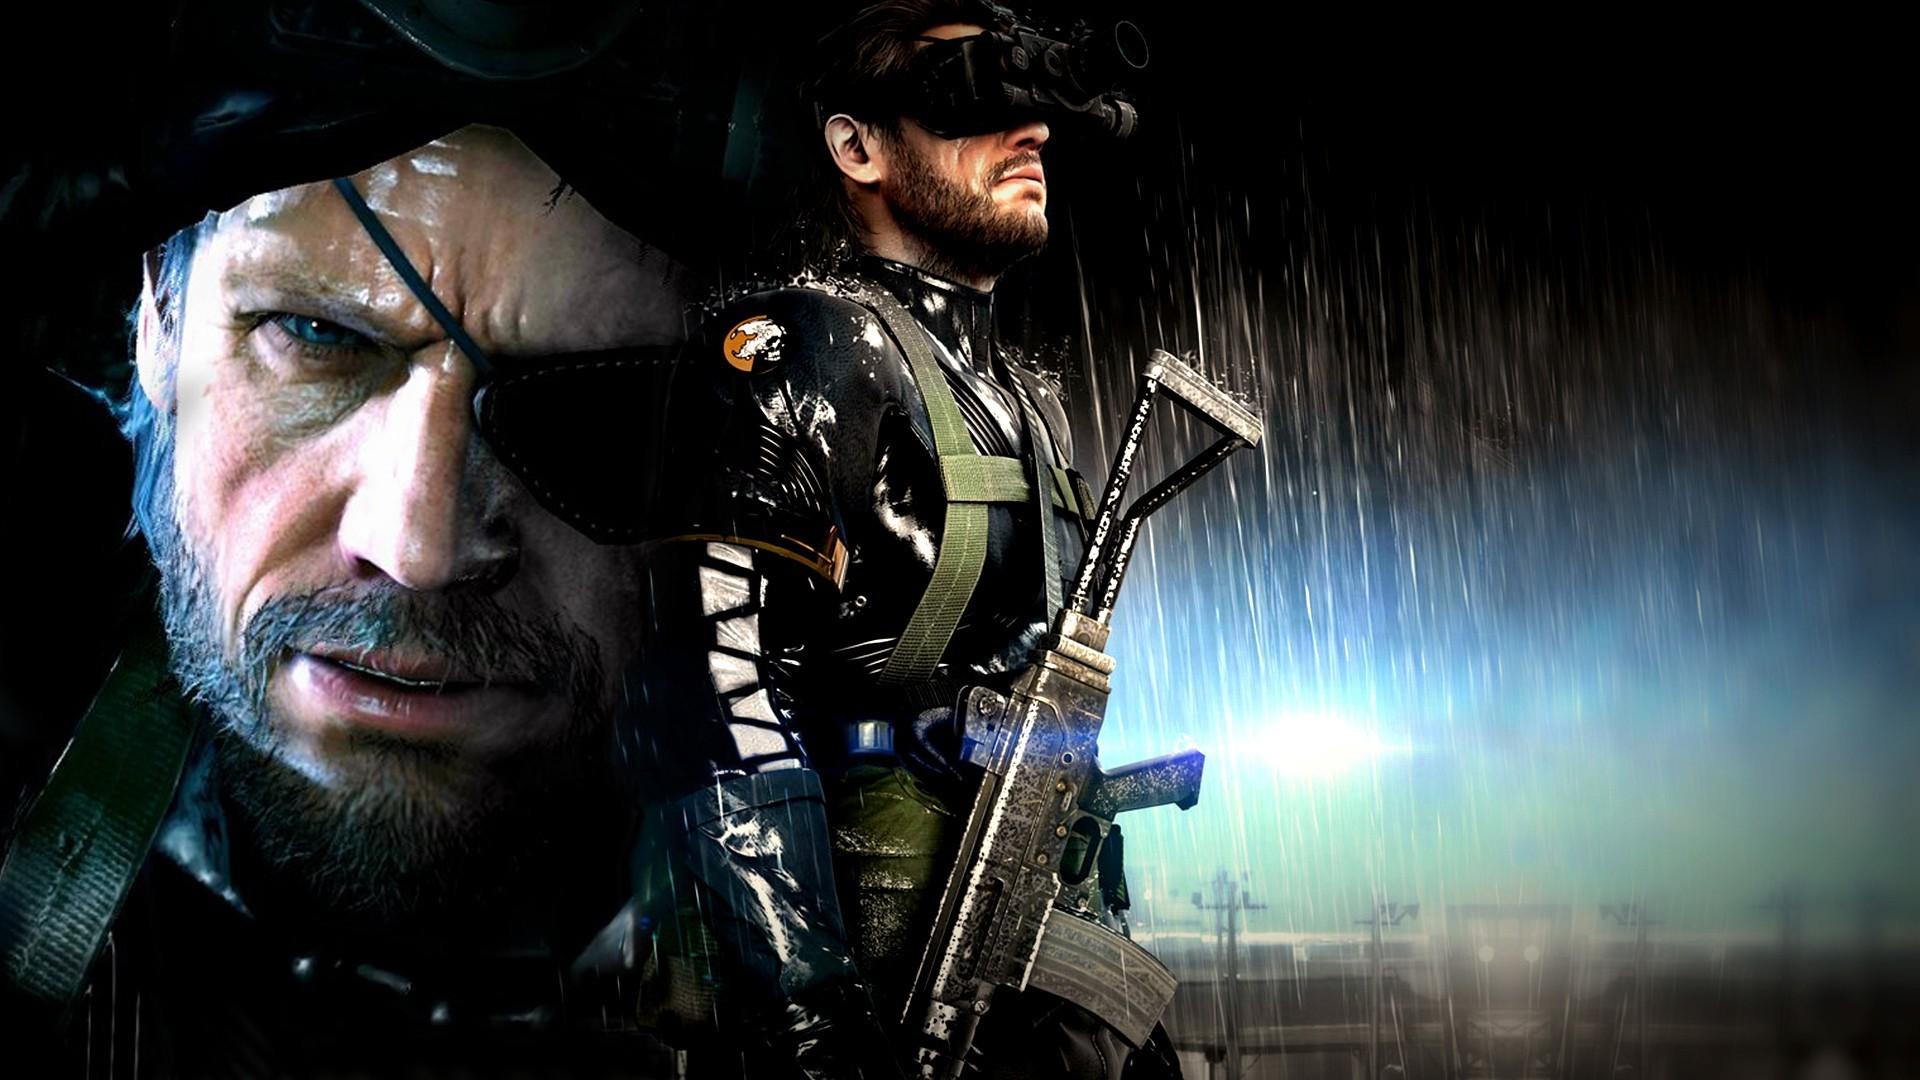 Wallpaper 1920x1080 Px Artwork Big Boss Metal Gear Solid